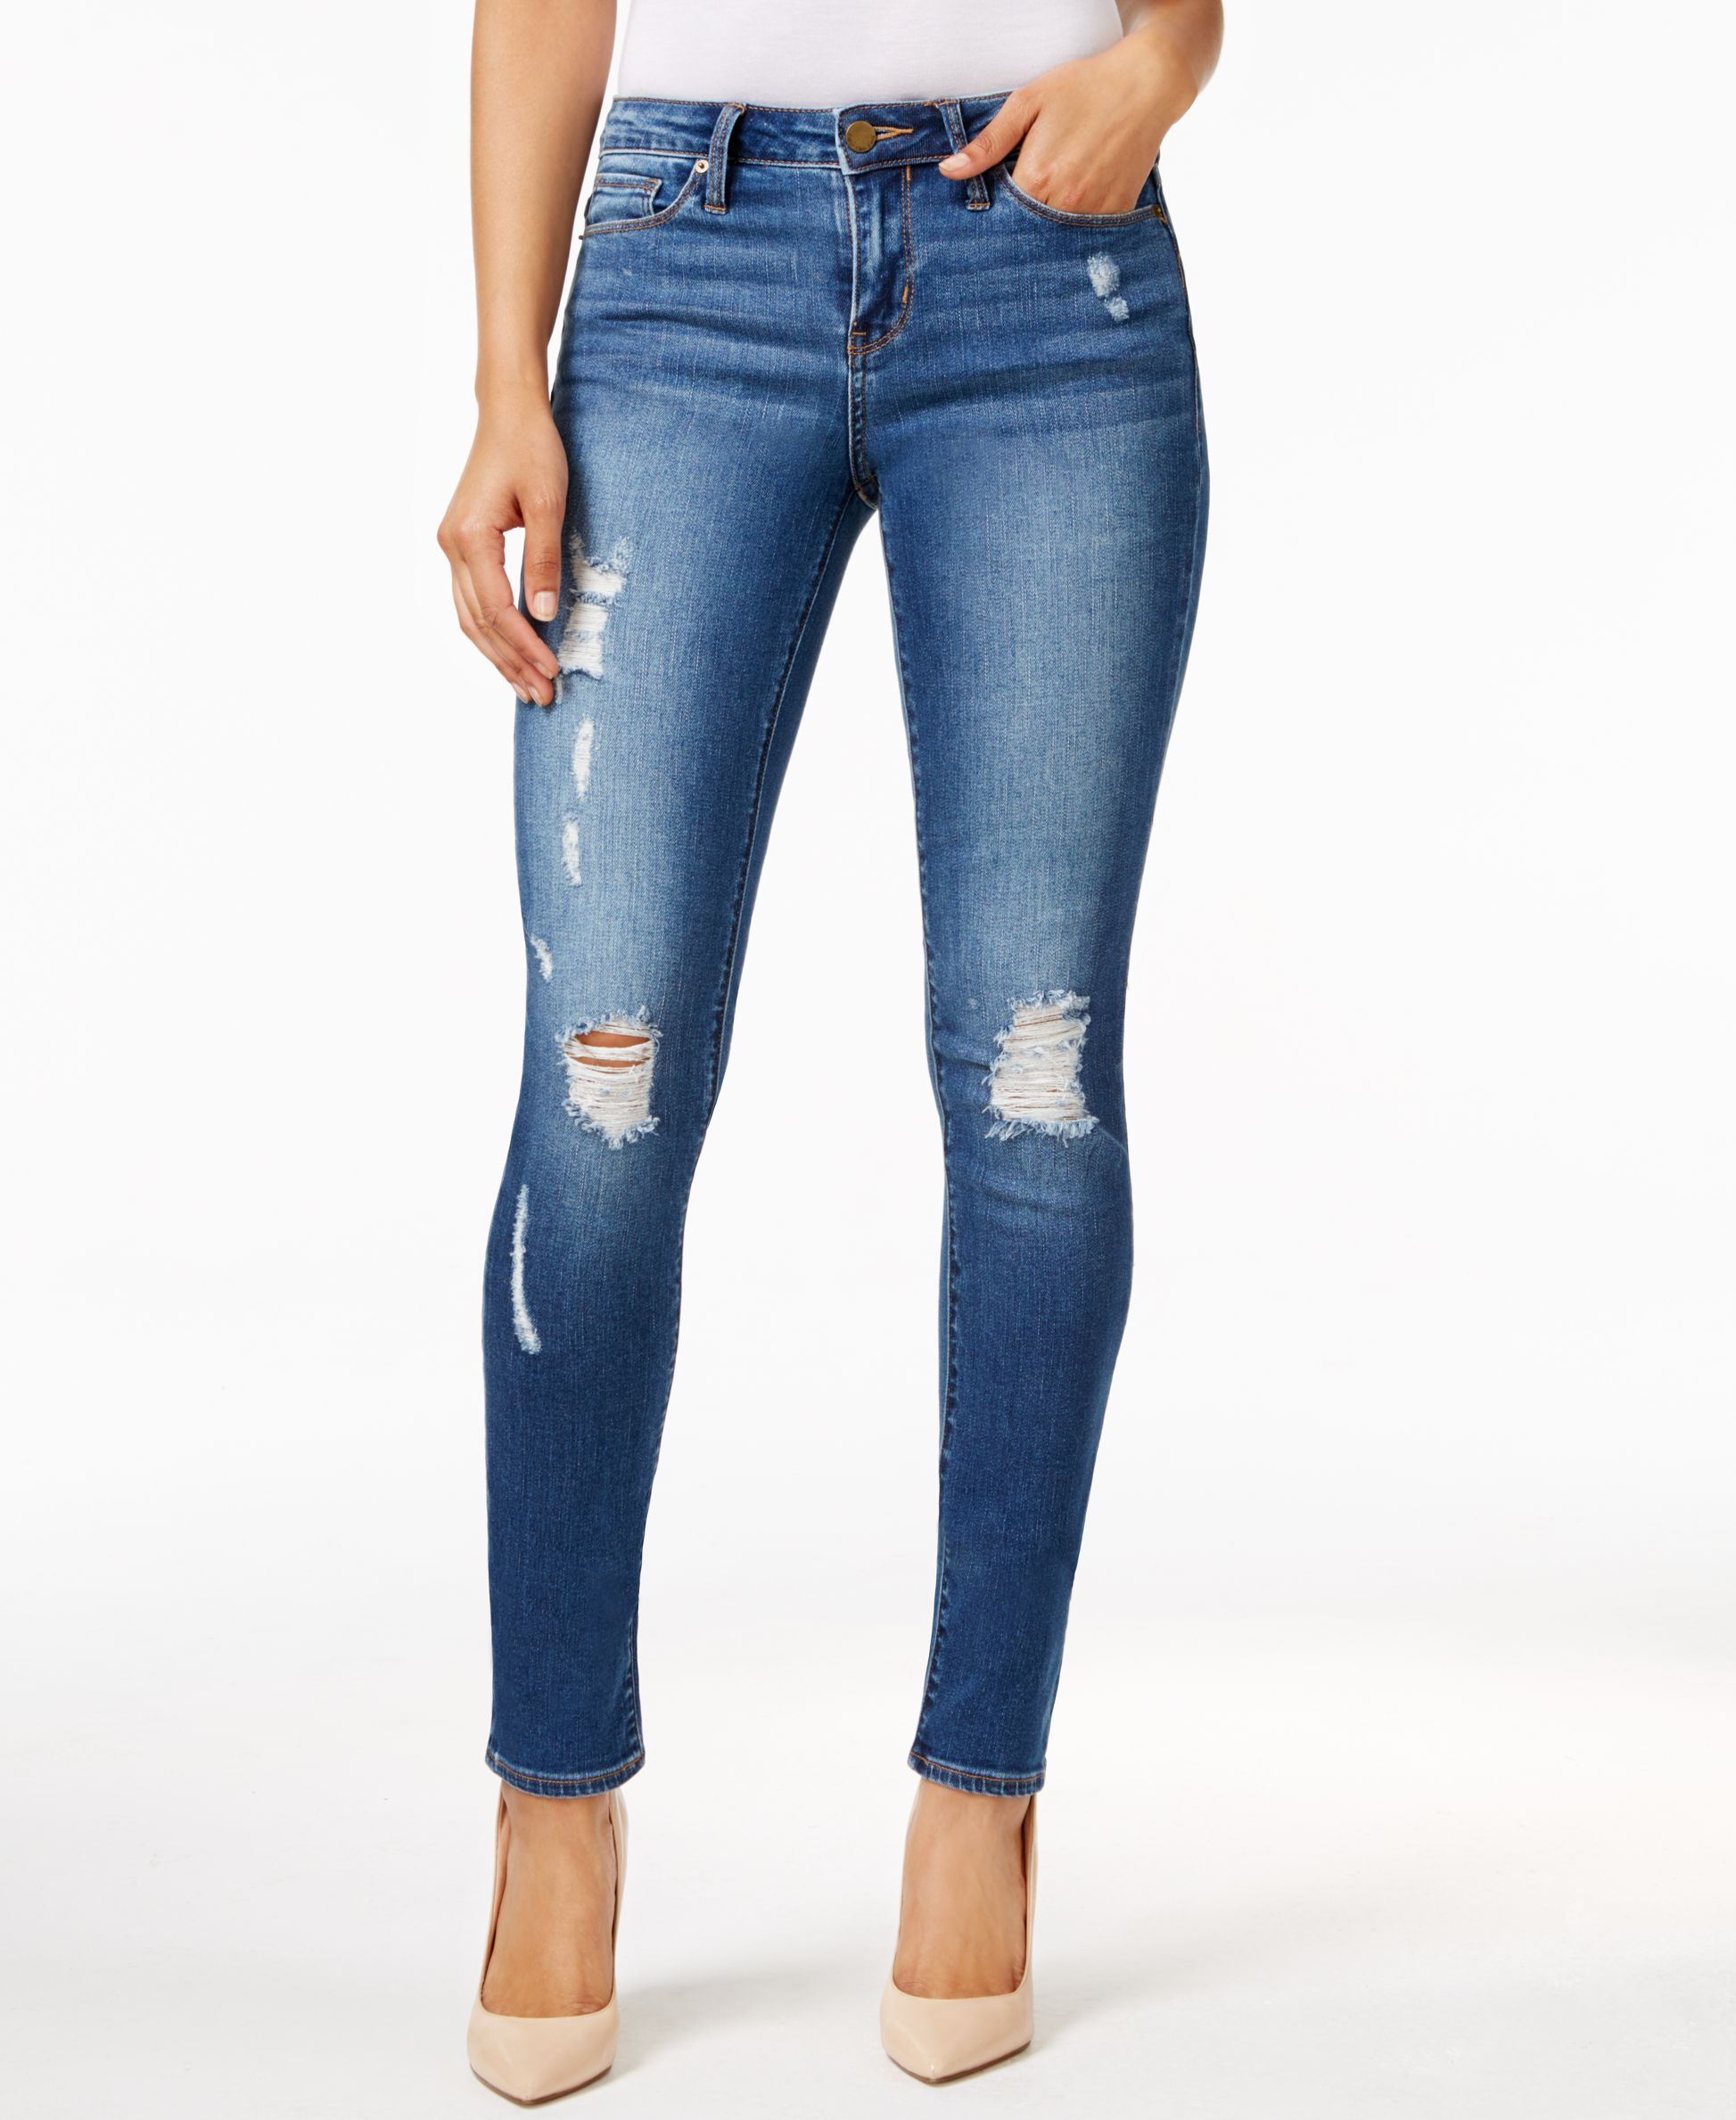 Calvin Klein Jeans Classic Blue Wash Ultimate Skinny Jeans Weiße Zerrissene  Jeans 3f81b69447b